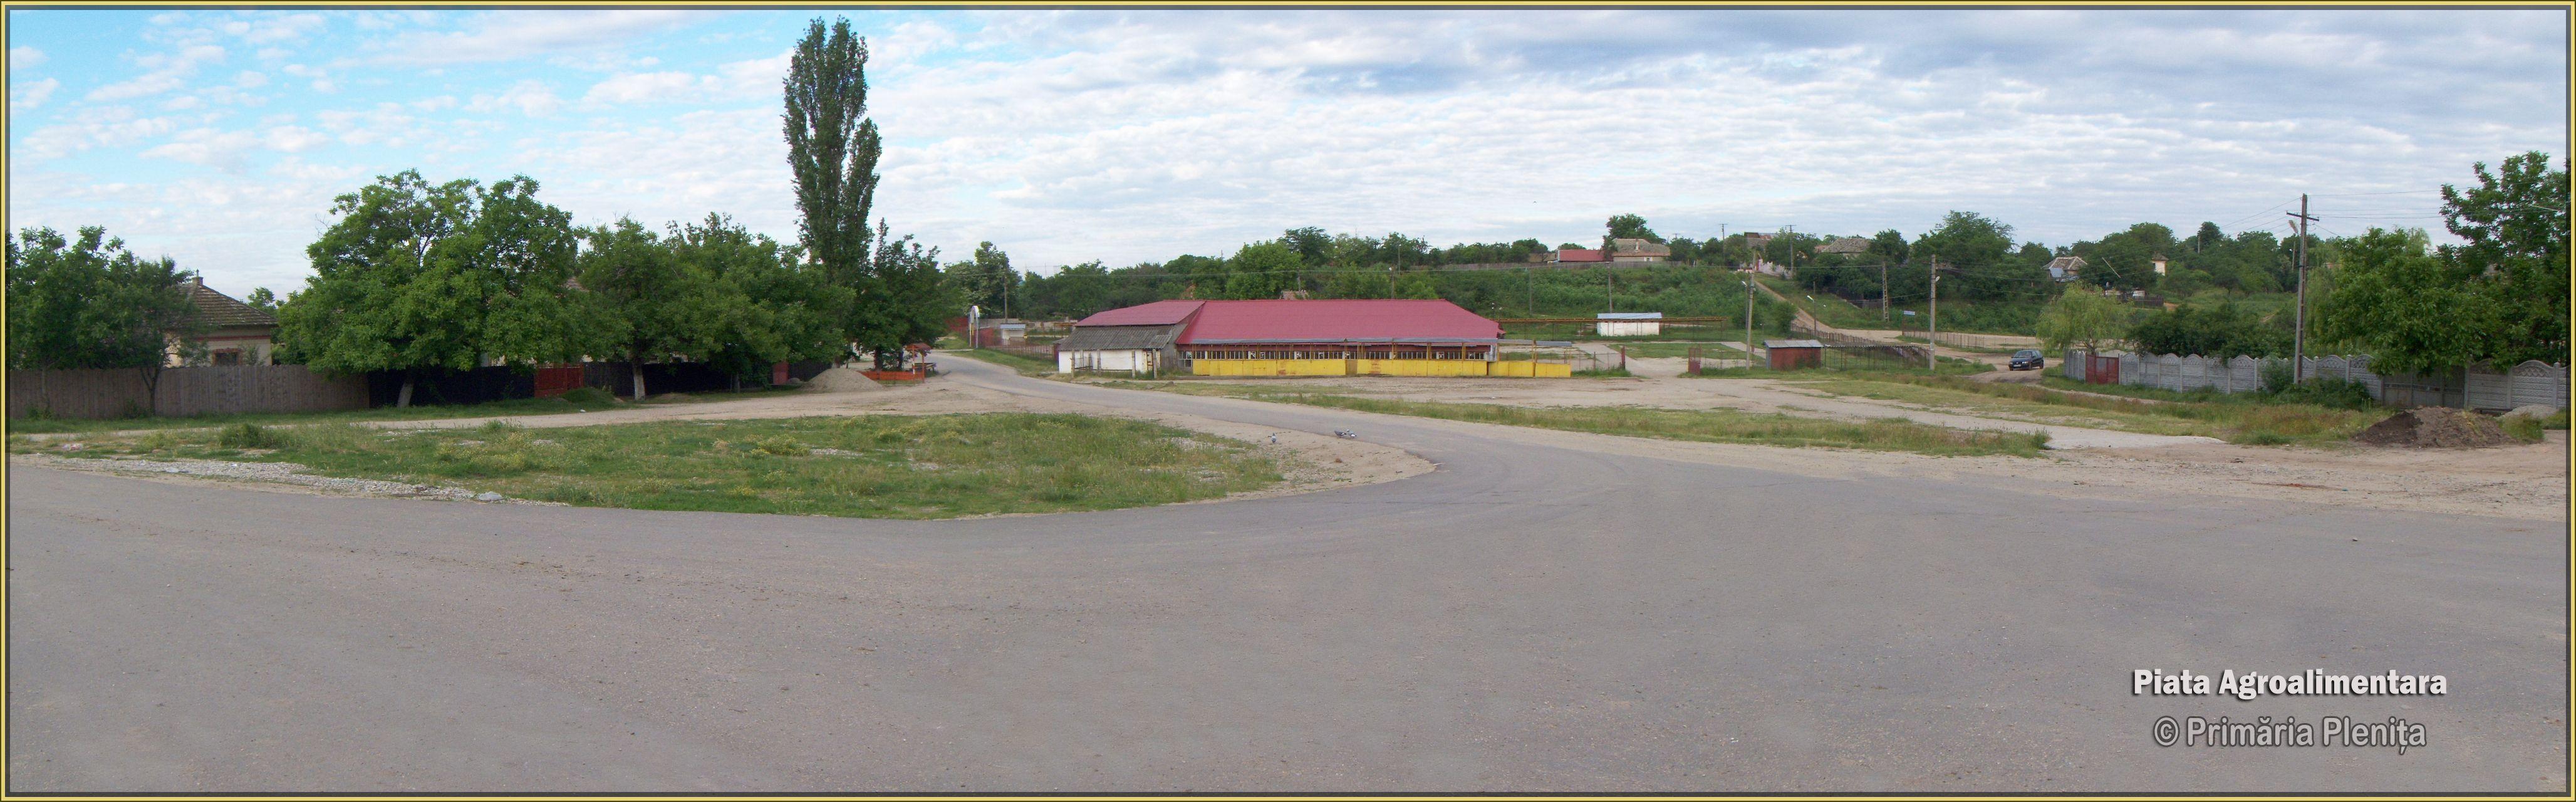 Piata-Agroalimentara